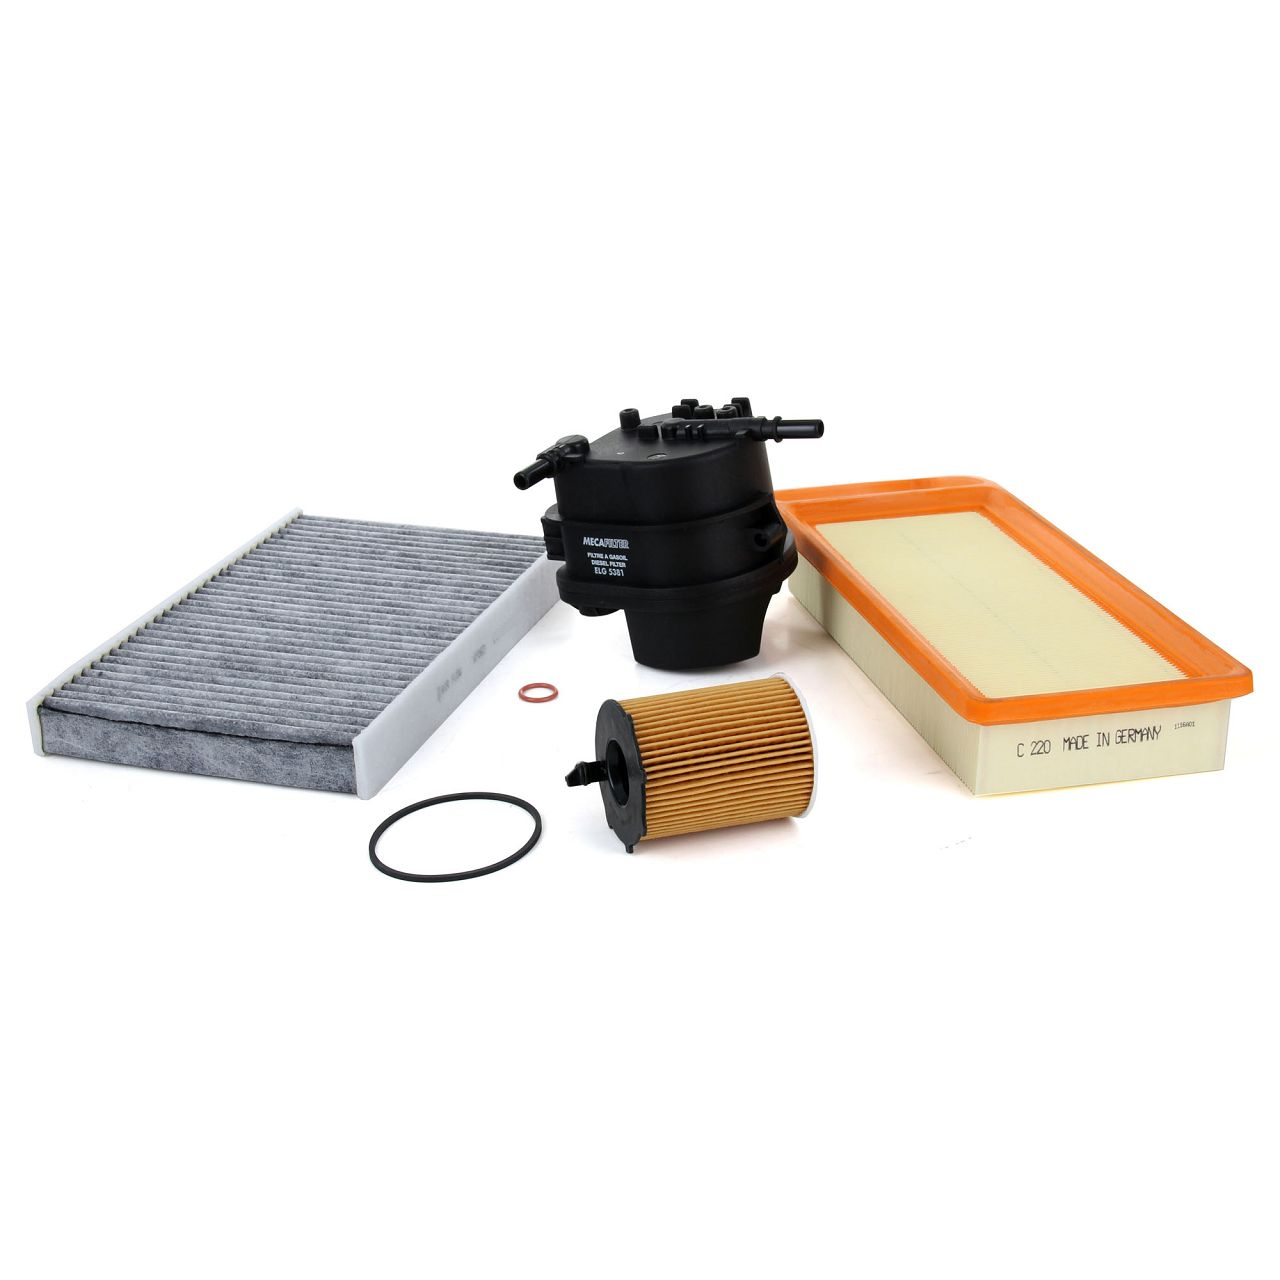 Inspektionskit Filterpaket Filterset für PEUGEOT 307 SW BREAK 1.4 HDI70 mit 68PS